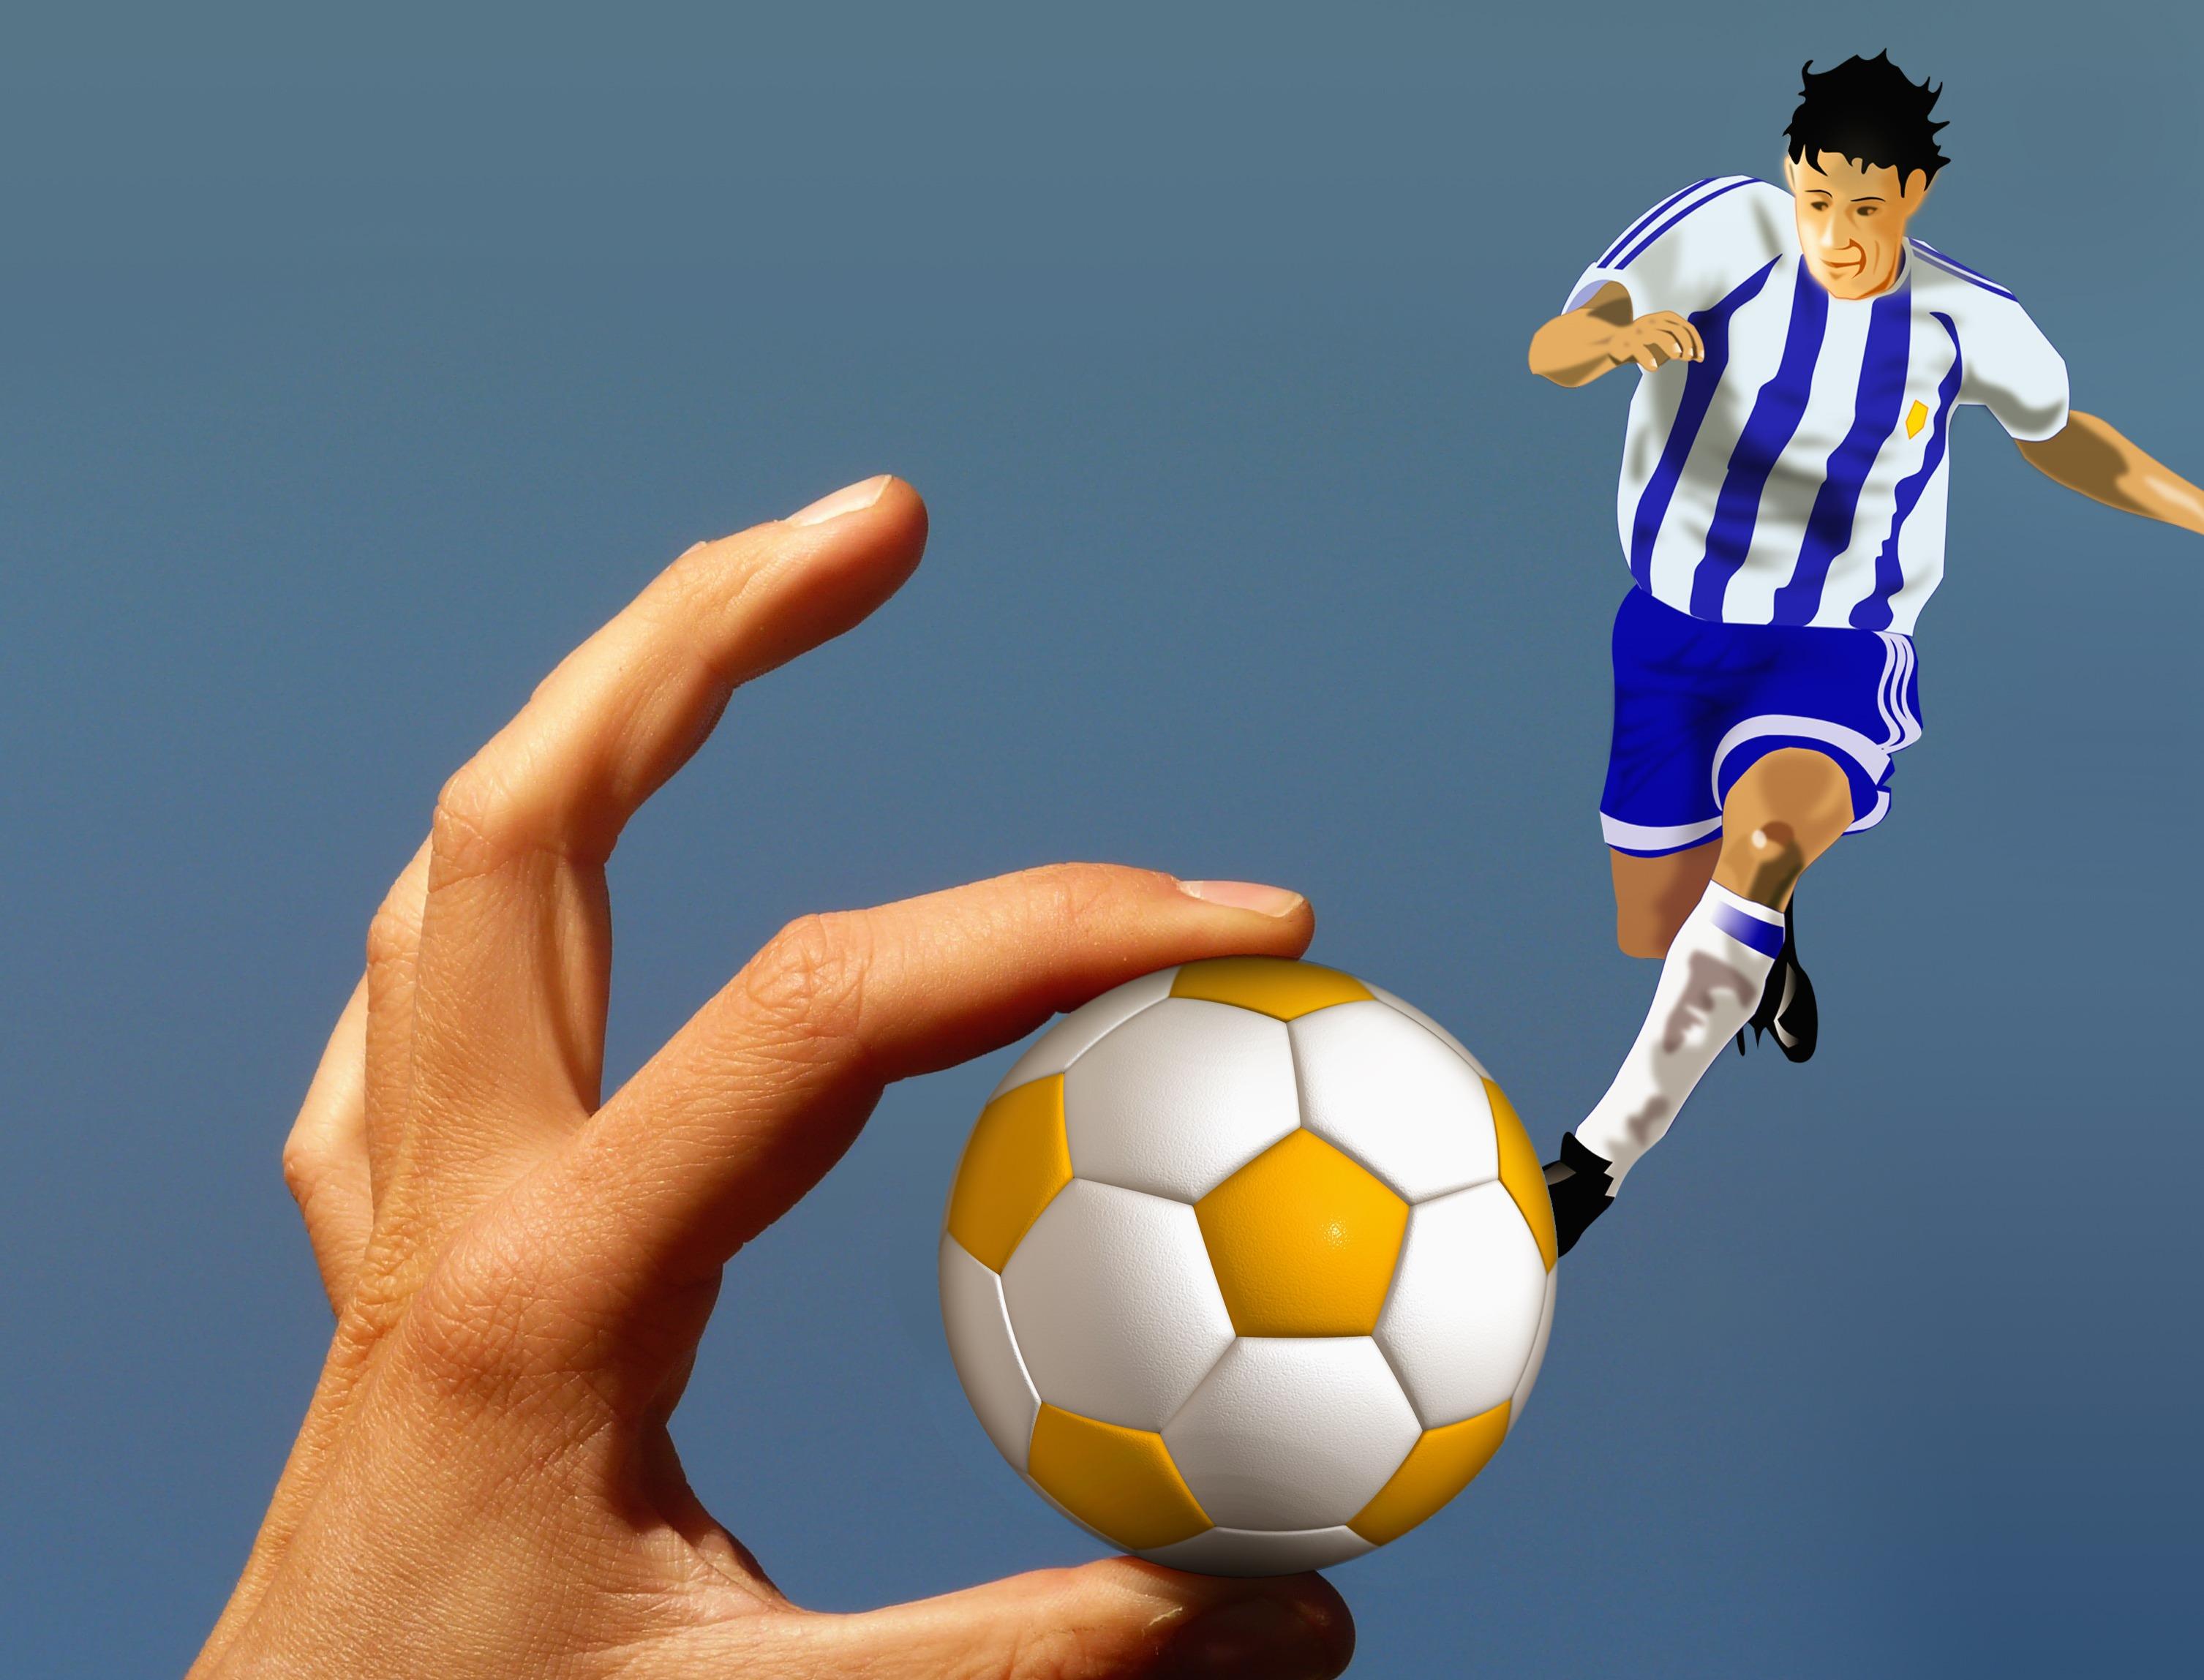 Fondos De Pantalla Fútbol Pelota Silueta Deporte: Fotos Gratis : Mano, Hombre, Silueta, Deporte, Campo